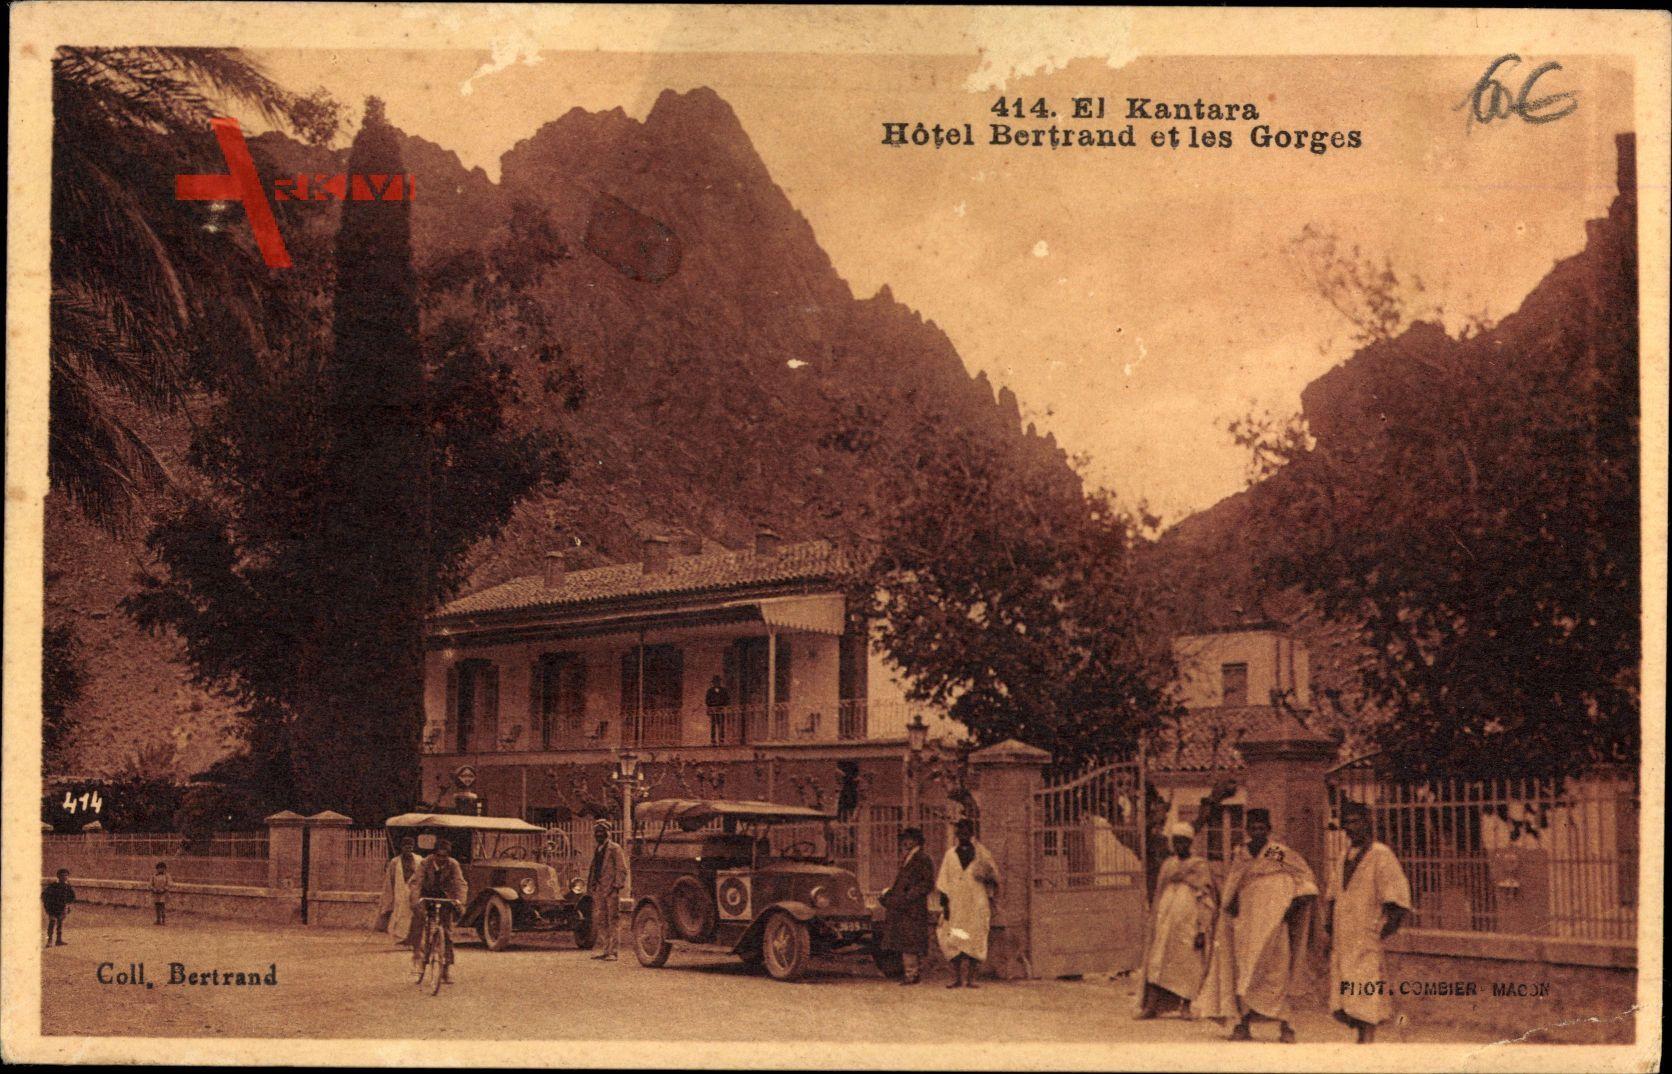 El Kantara Ägypten, Hotel Bertrand et les Gorges, Autos